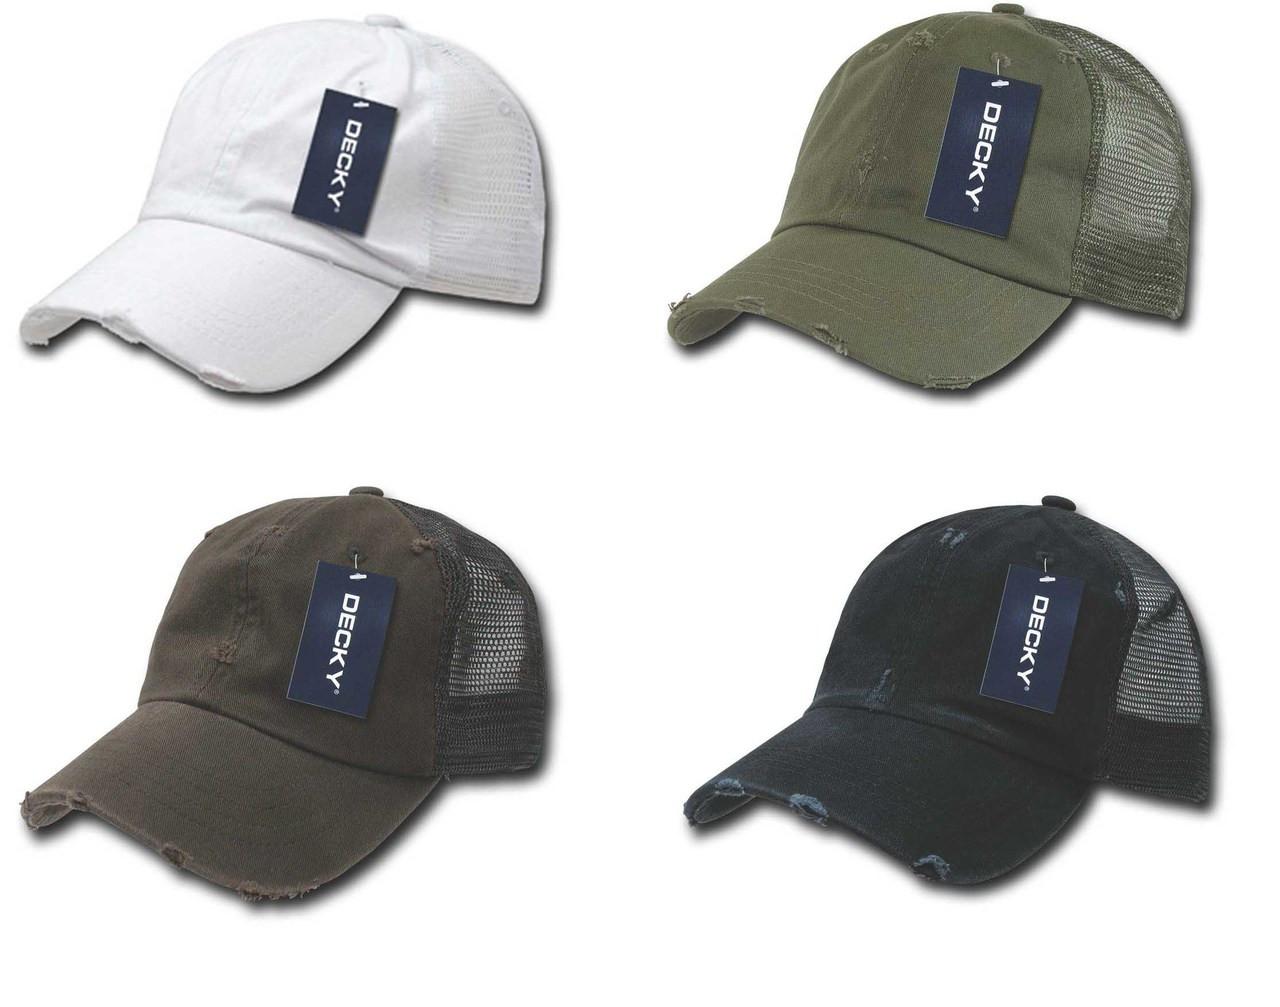 Vintage Distressed Retro Polo Low Profile Mesh Back Baseball Cap Golf Hat  Caps df8e994d464c